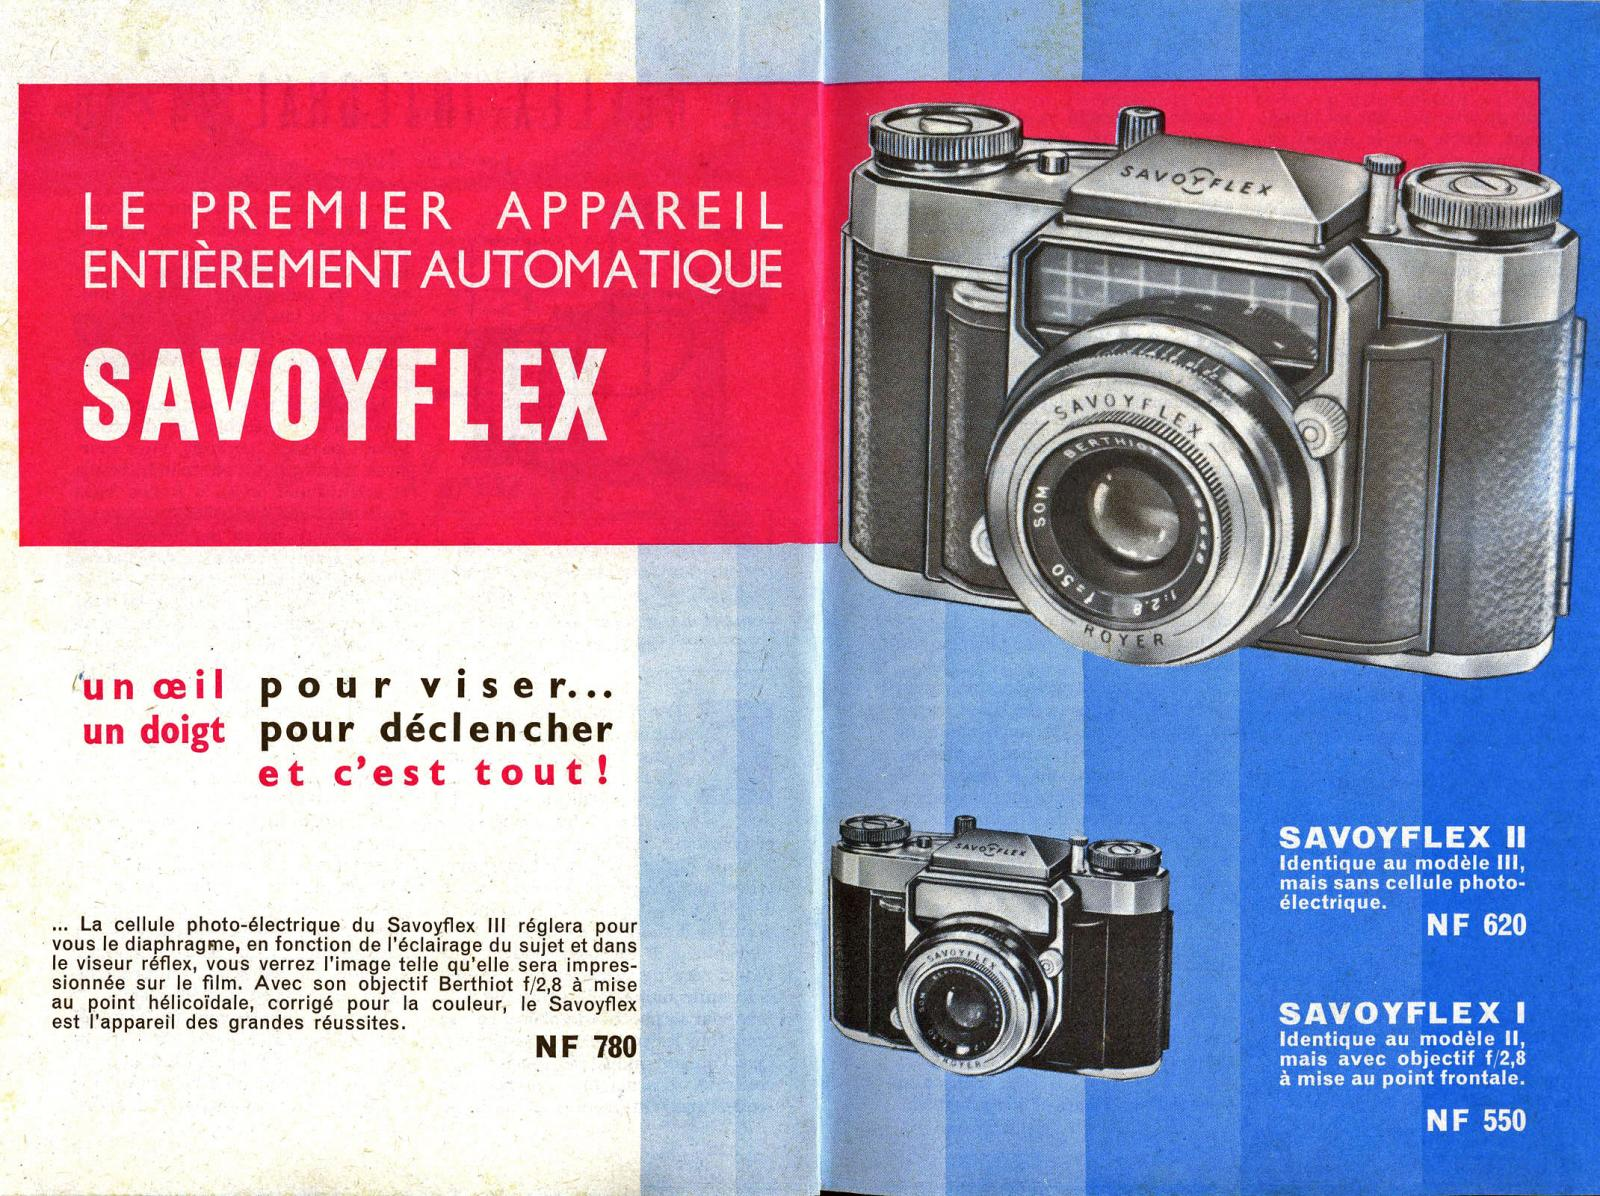 Wallpaper 1449-7  SITO de ROYER  Savoyflex type II, collection AMI Appareils photos